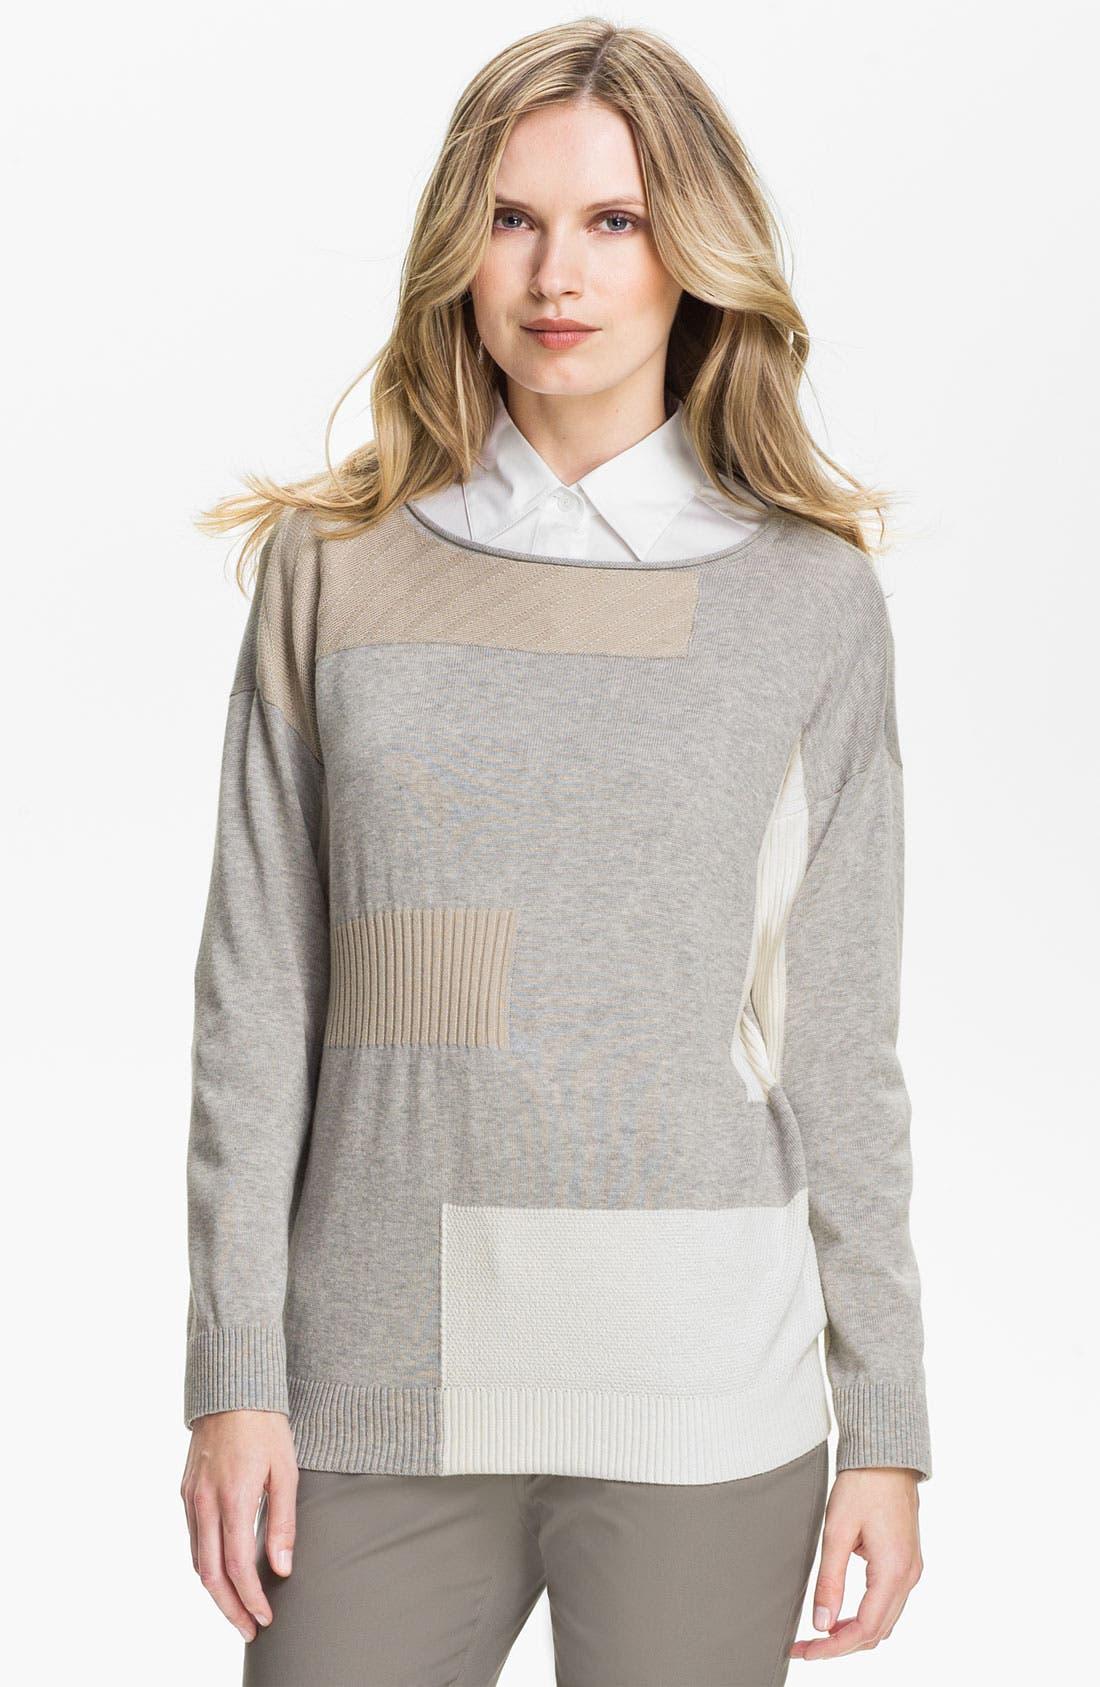 Alternate Image 1 Selected - Lafayette 148 New York Intarsia Colorblock Sweater